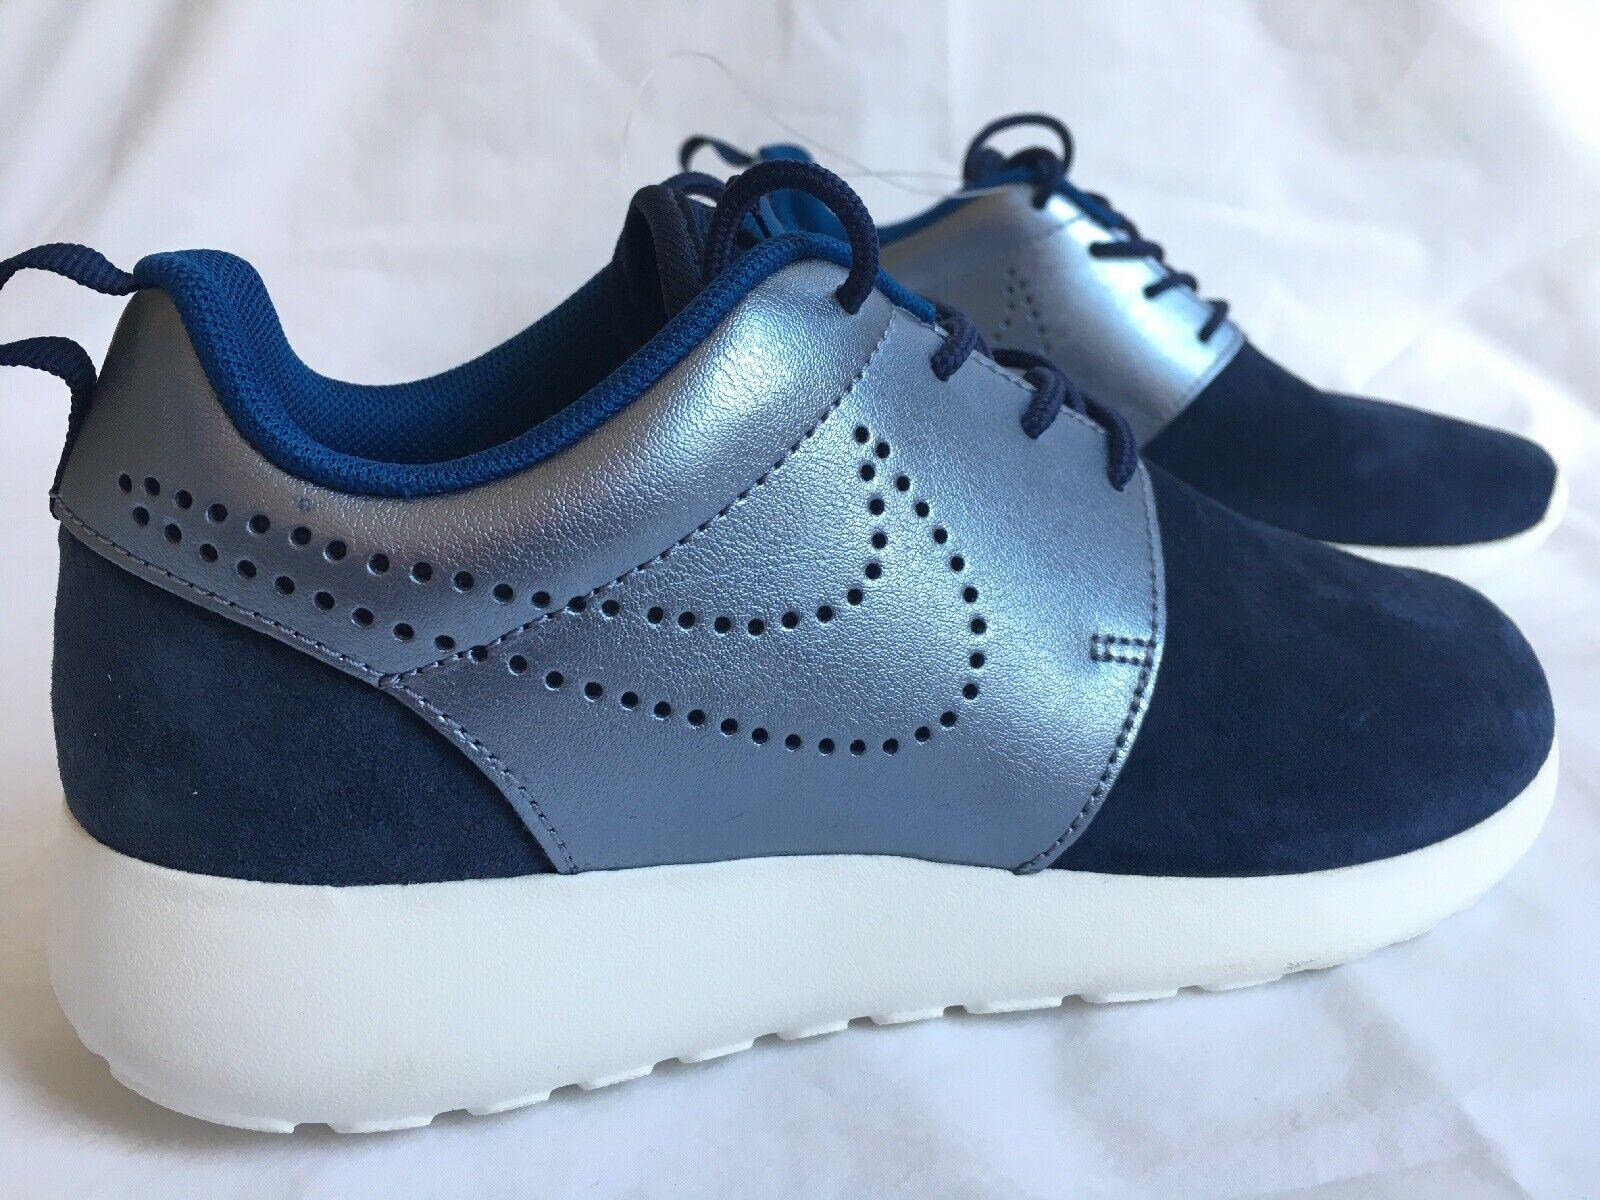 New Nike Roshe One Suede Women's Women's Women's Sneakers Navy Metallic bluee Size 7 8eeda1